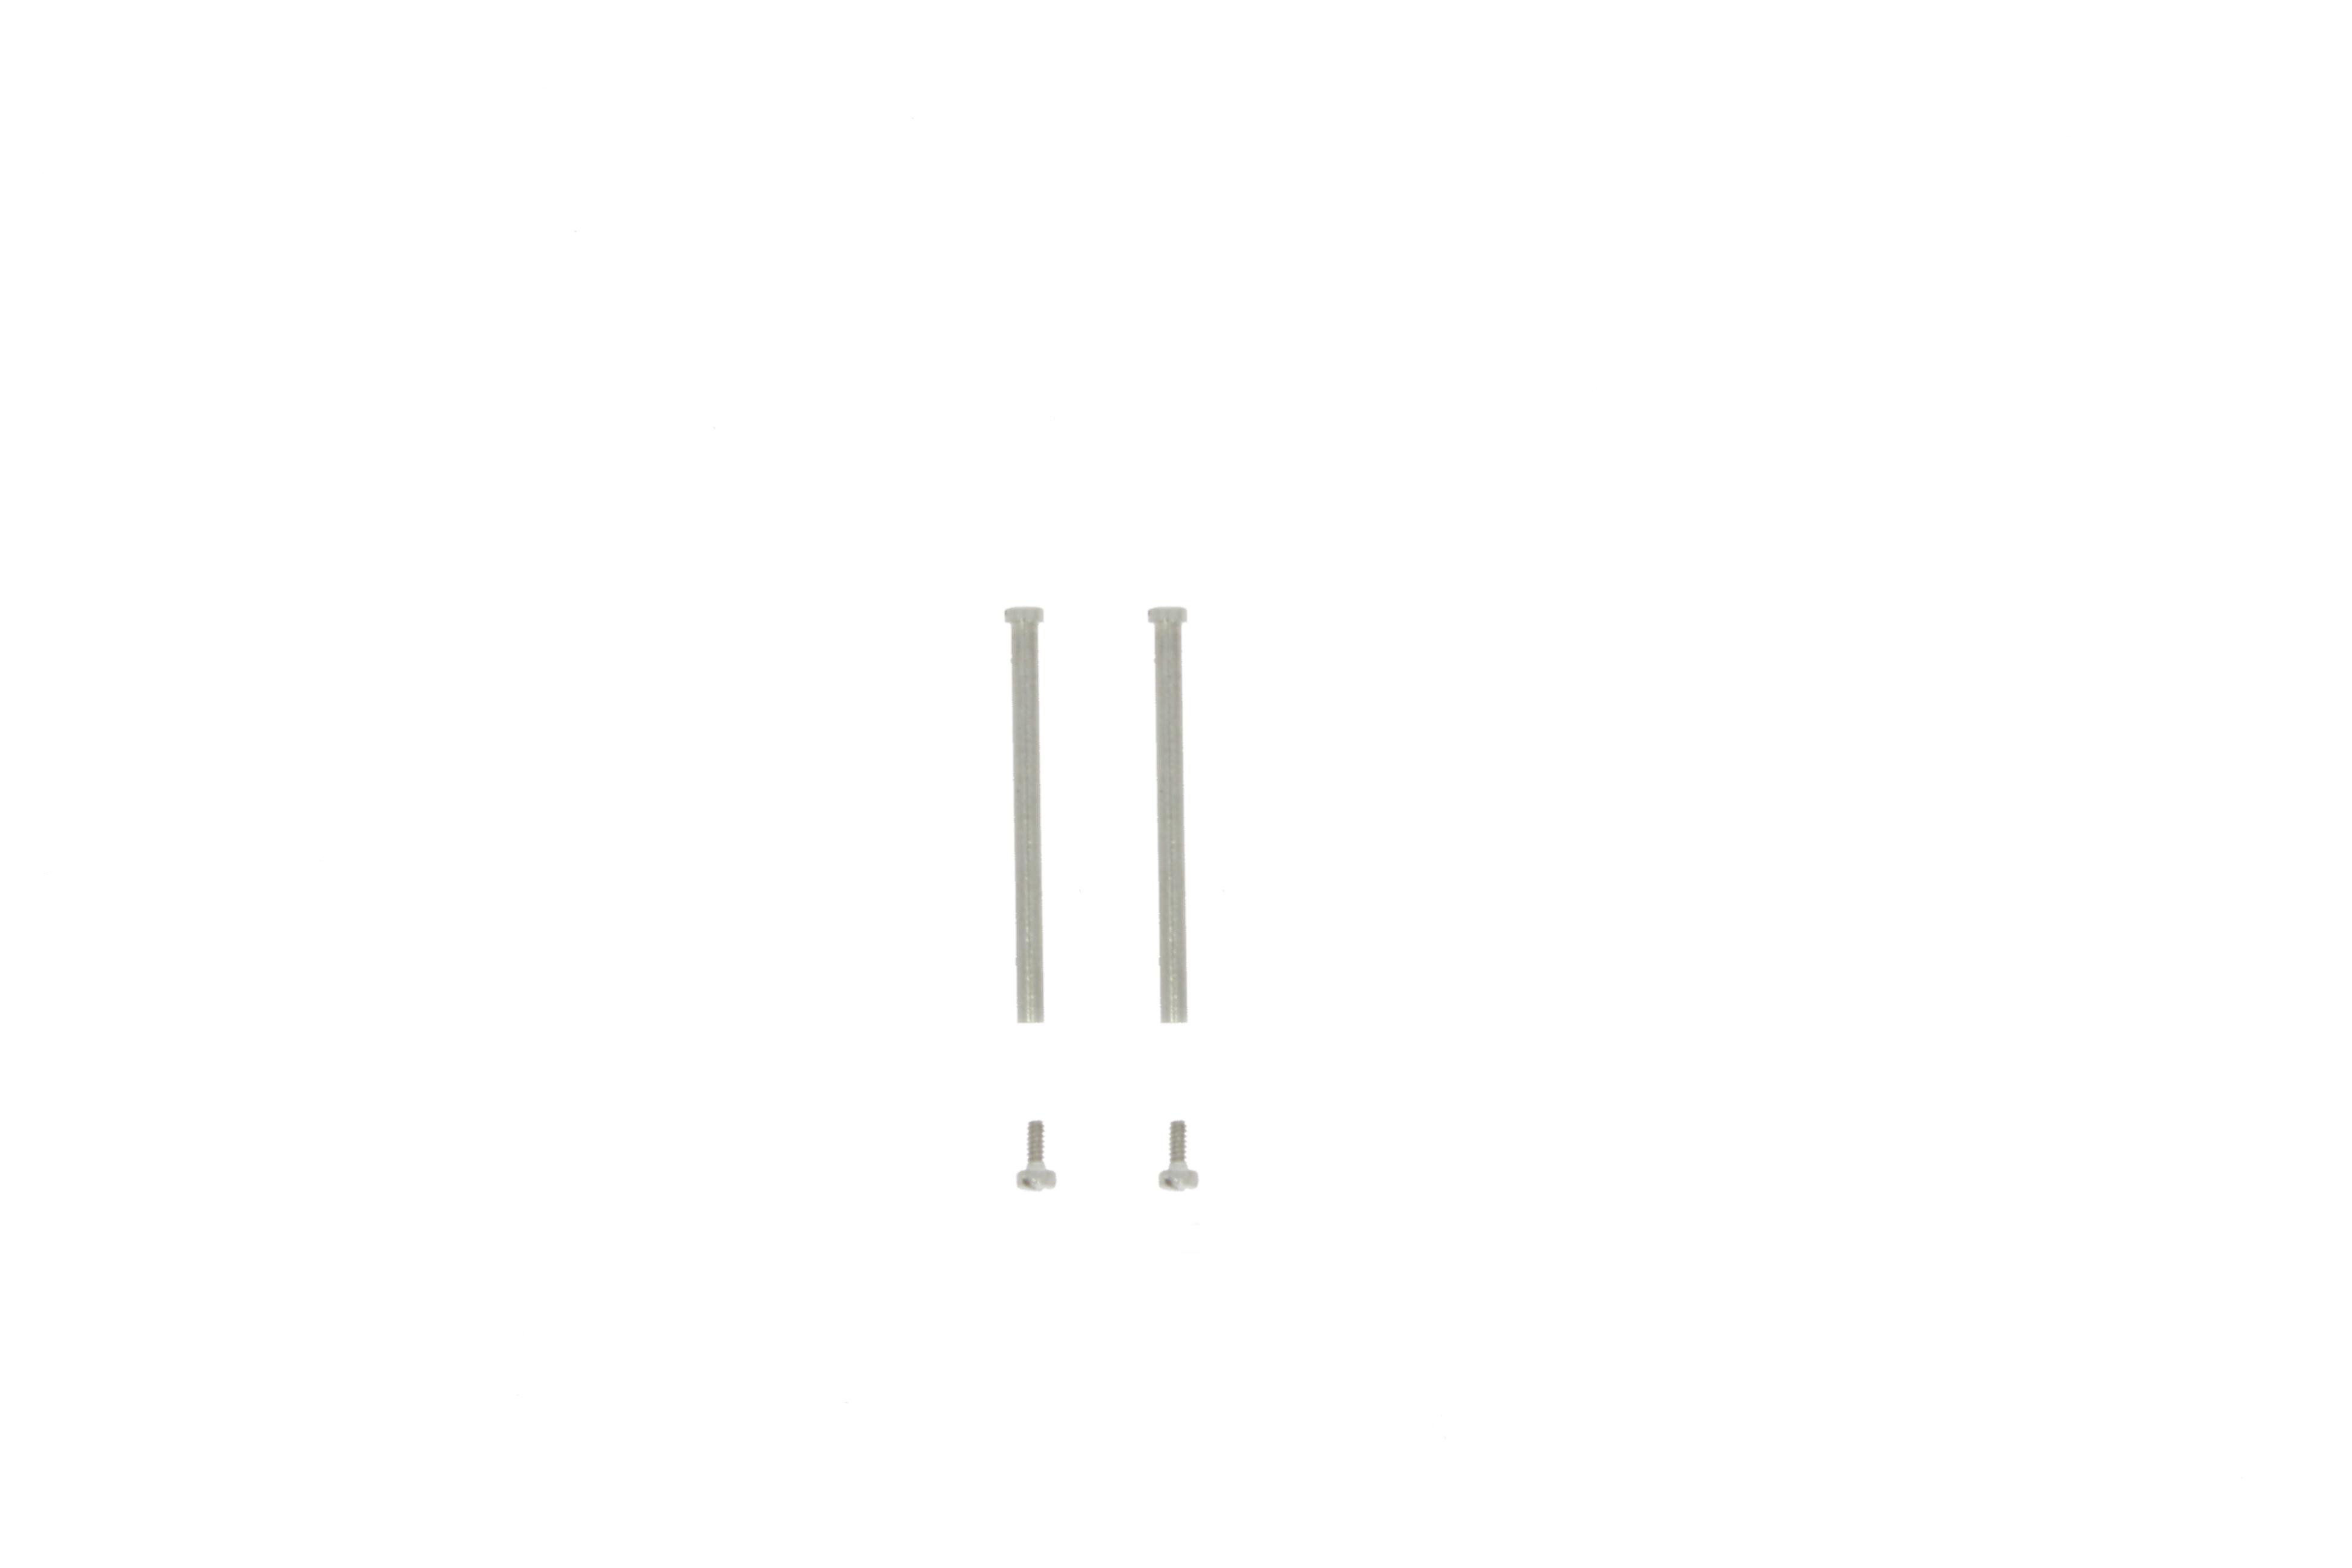 Michael Kors MK5235 Horlogeband/-kast Schroefpen (2 stuks)